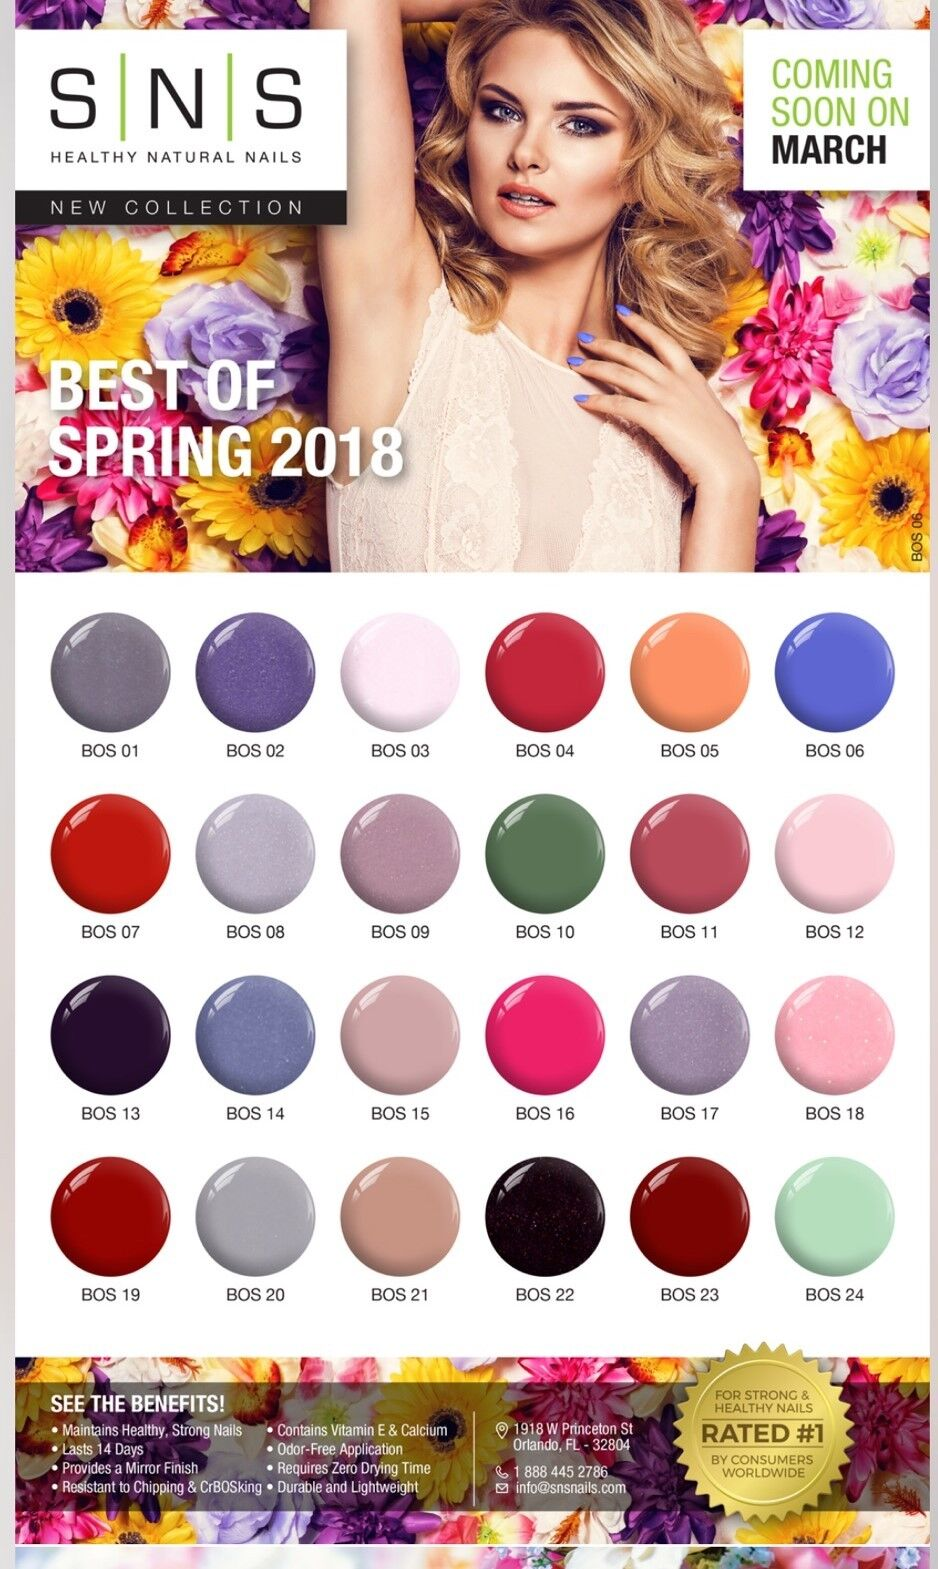 SNS Nail Color Dipping Powder NEW  Spring Collection BOS & N